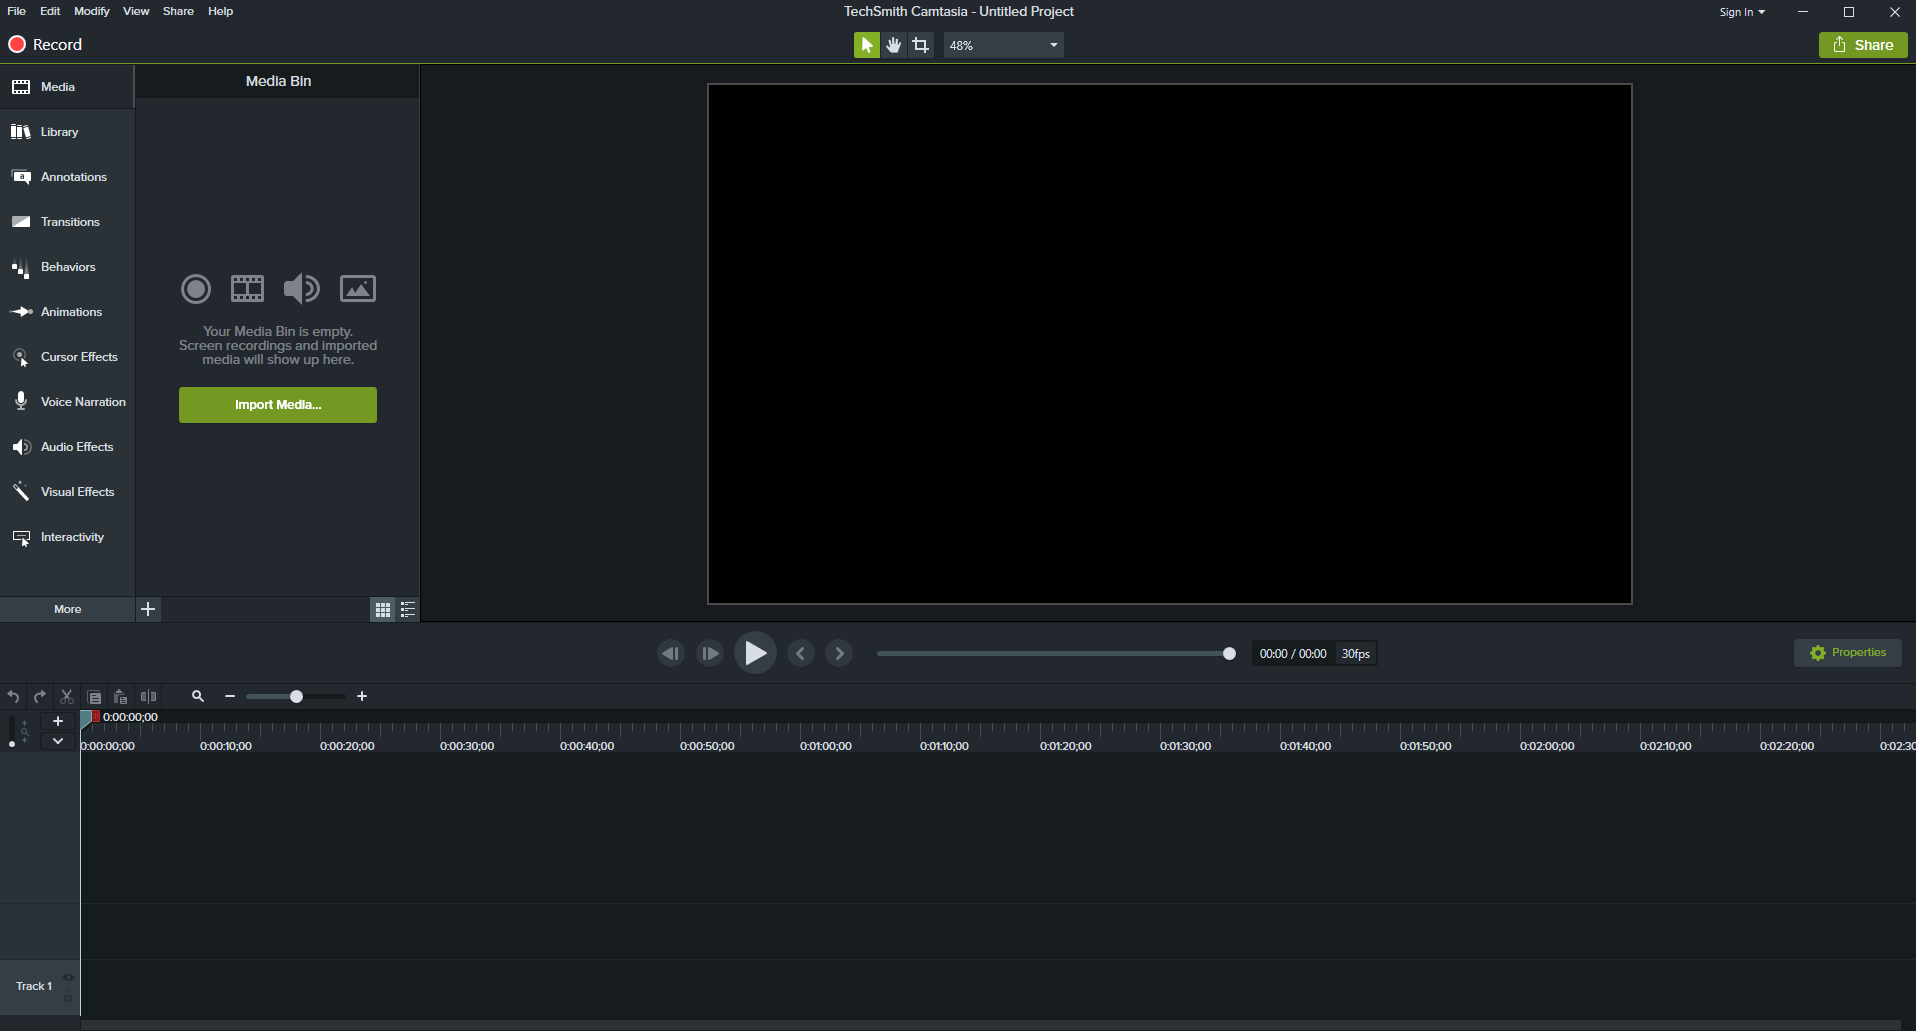 Screenshot der Screencast Software TechSmith Camtasia